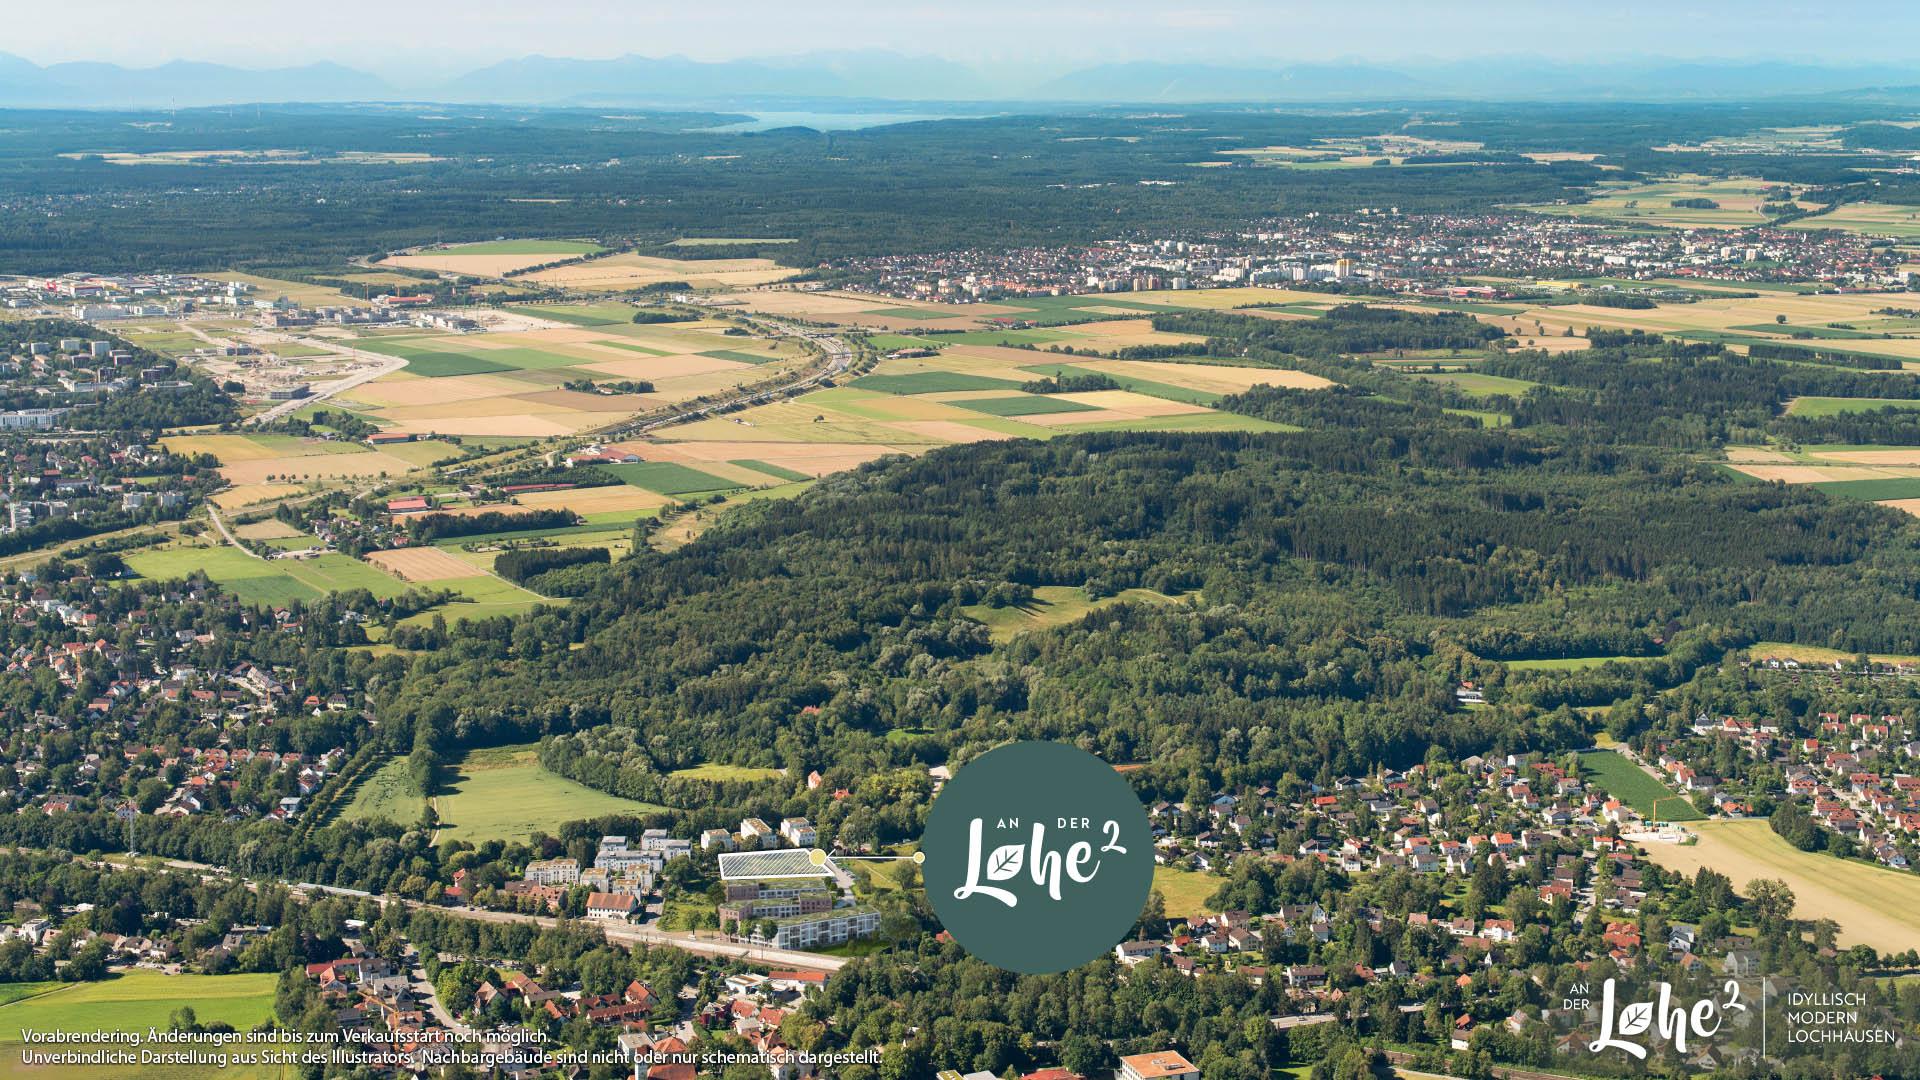 Immobilie An der Lohe 2 - Luftbild